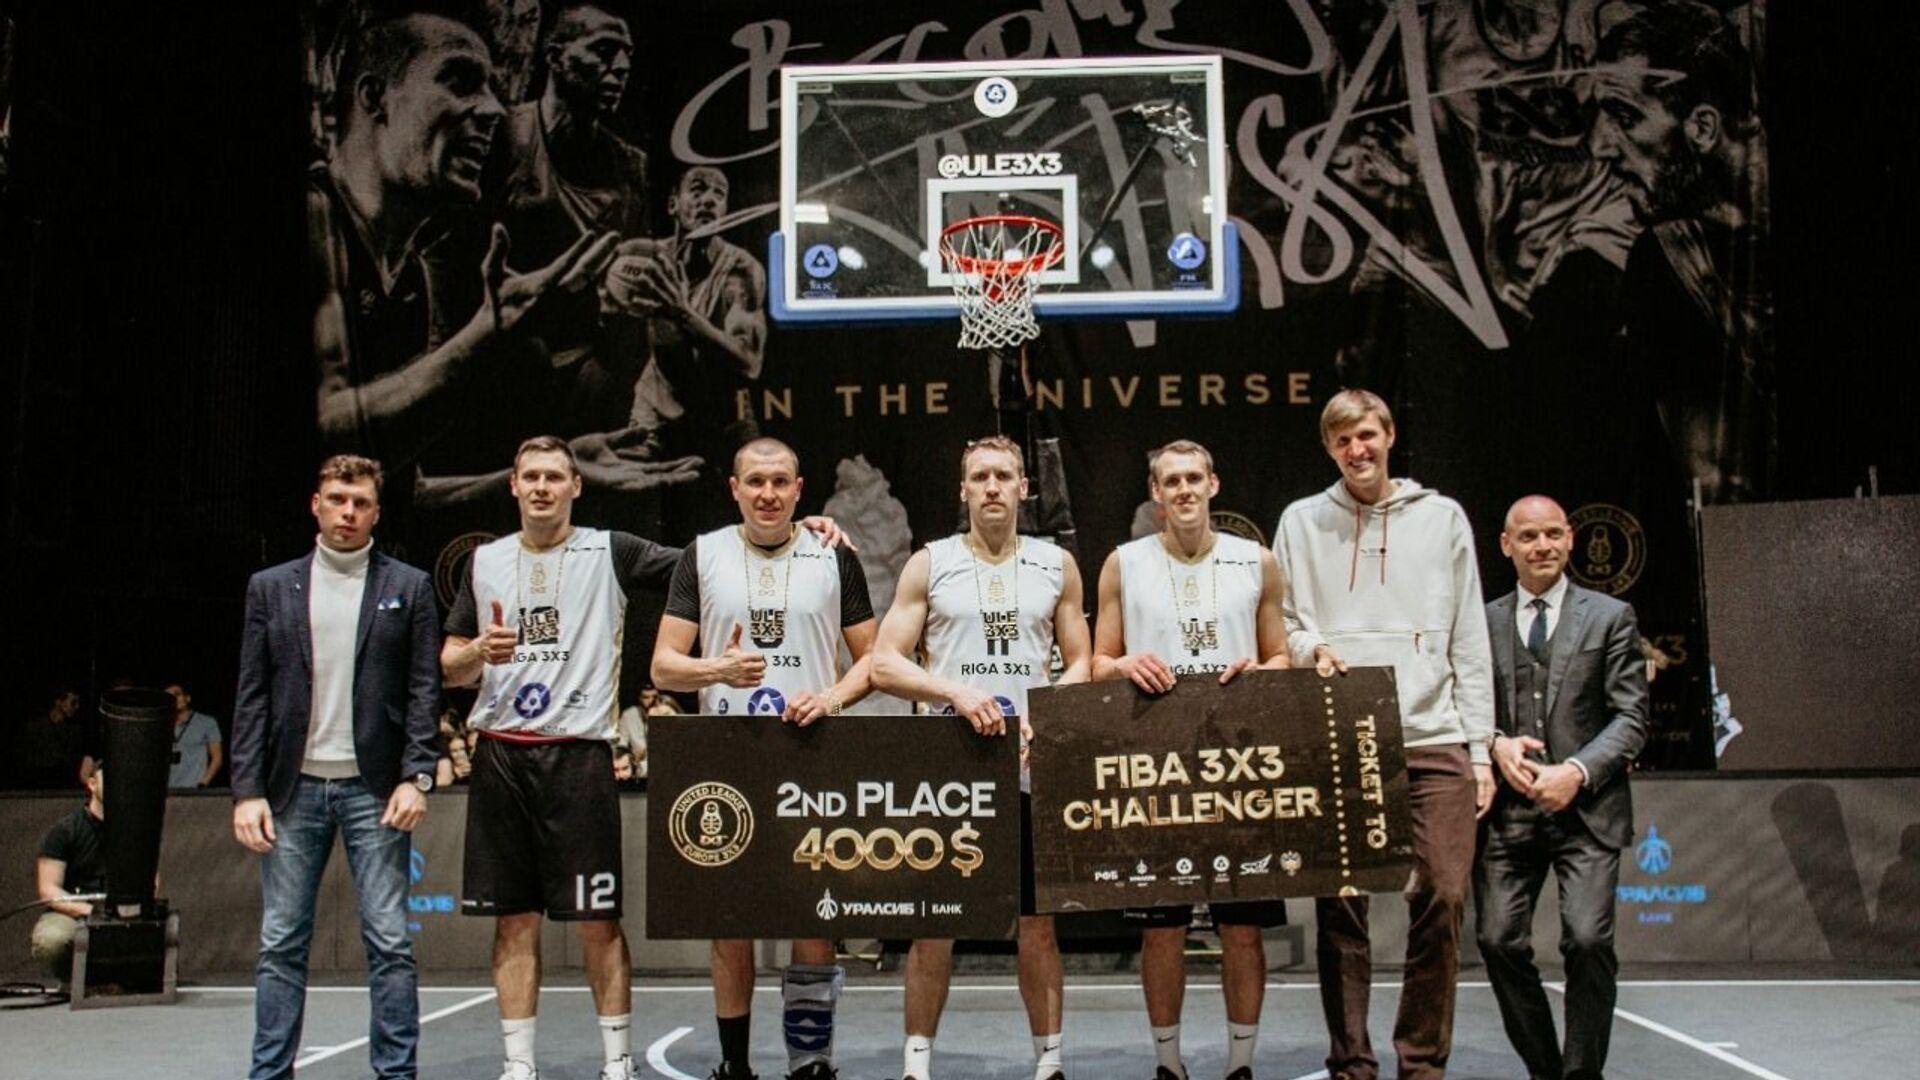 Команда Рига по баскетболу 3×3 - Sputnik Латвия, 1920, 28.04.2021